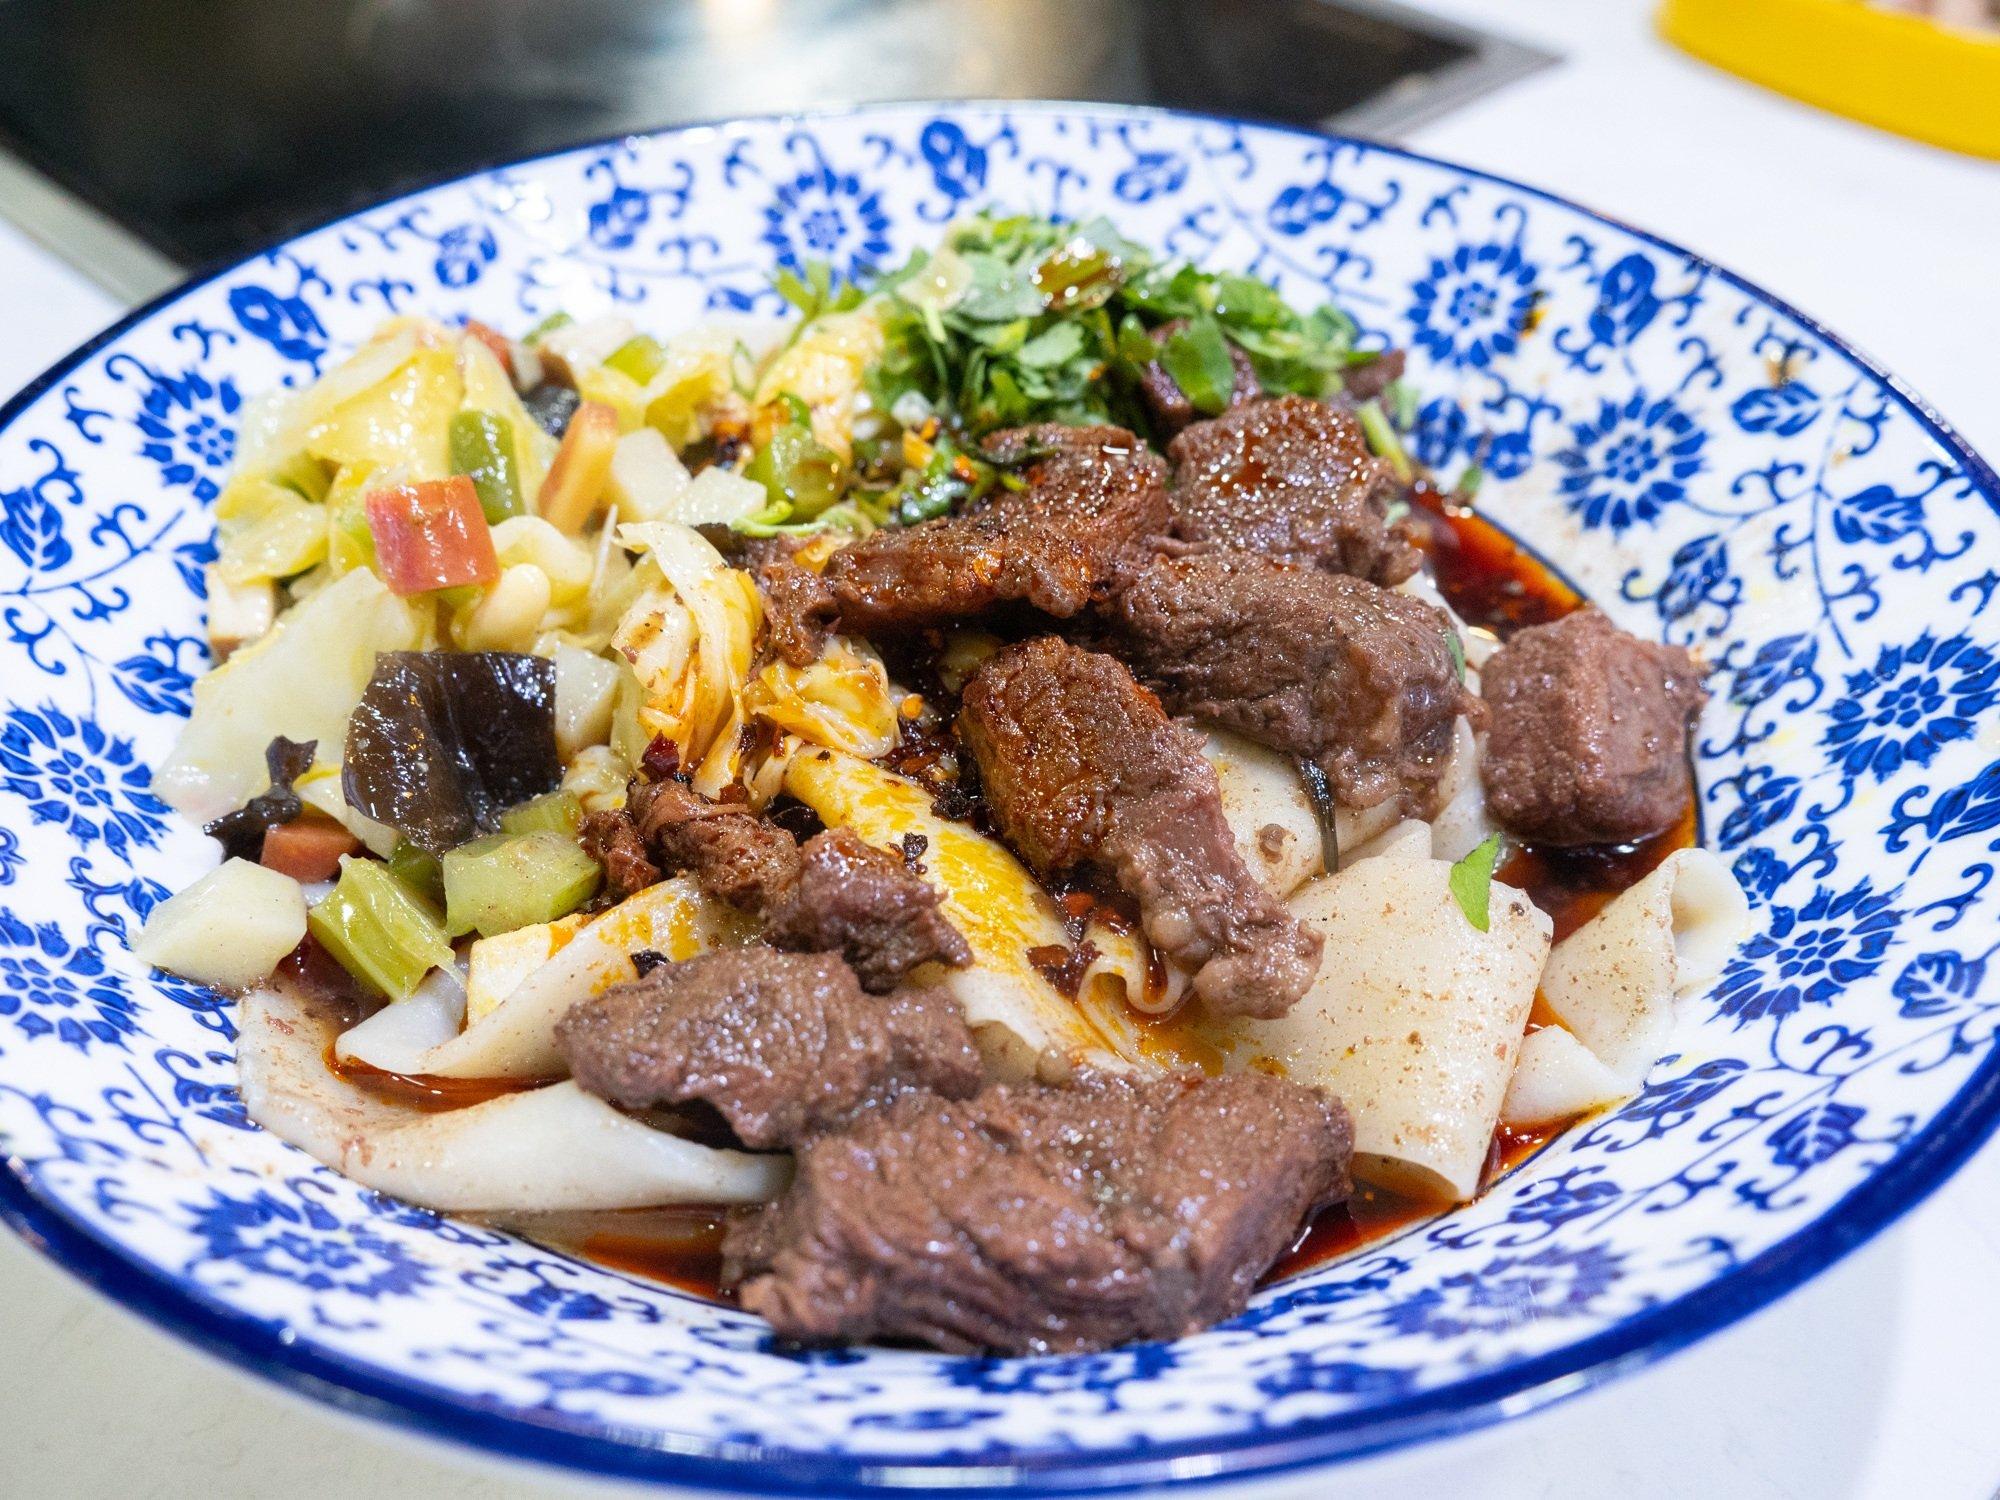 A nice big bowl of Xi'an biang biang mian noodles